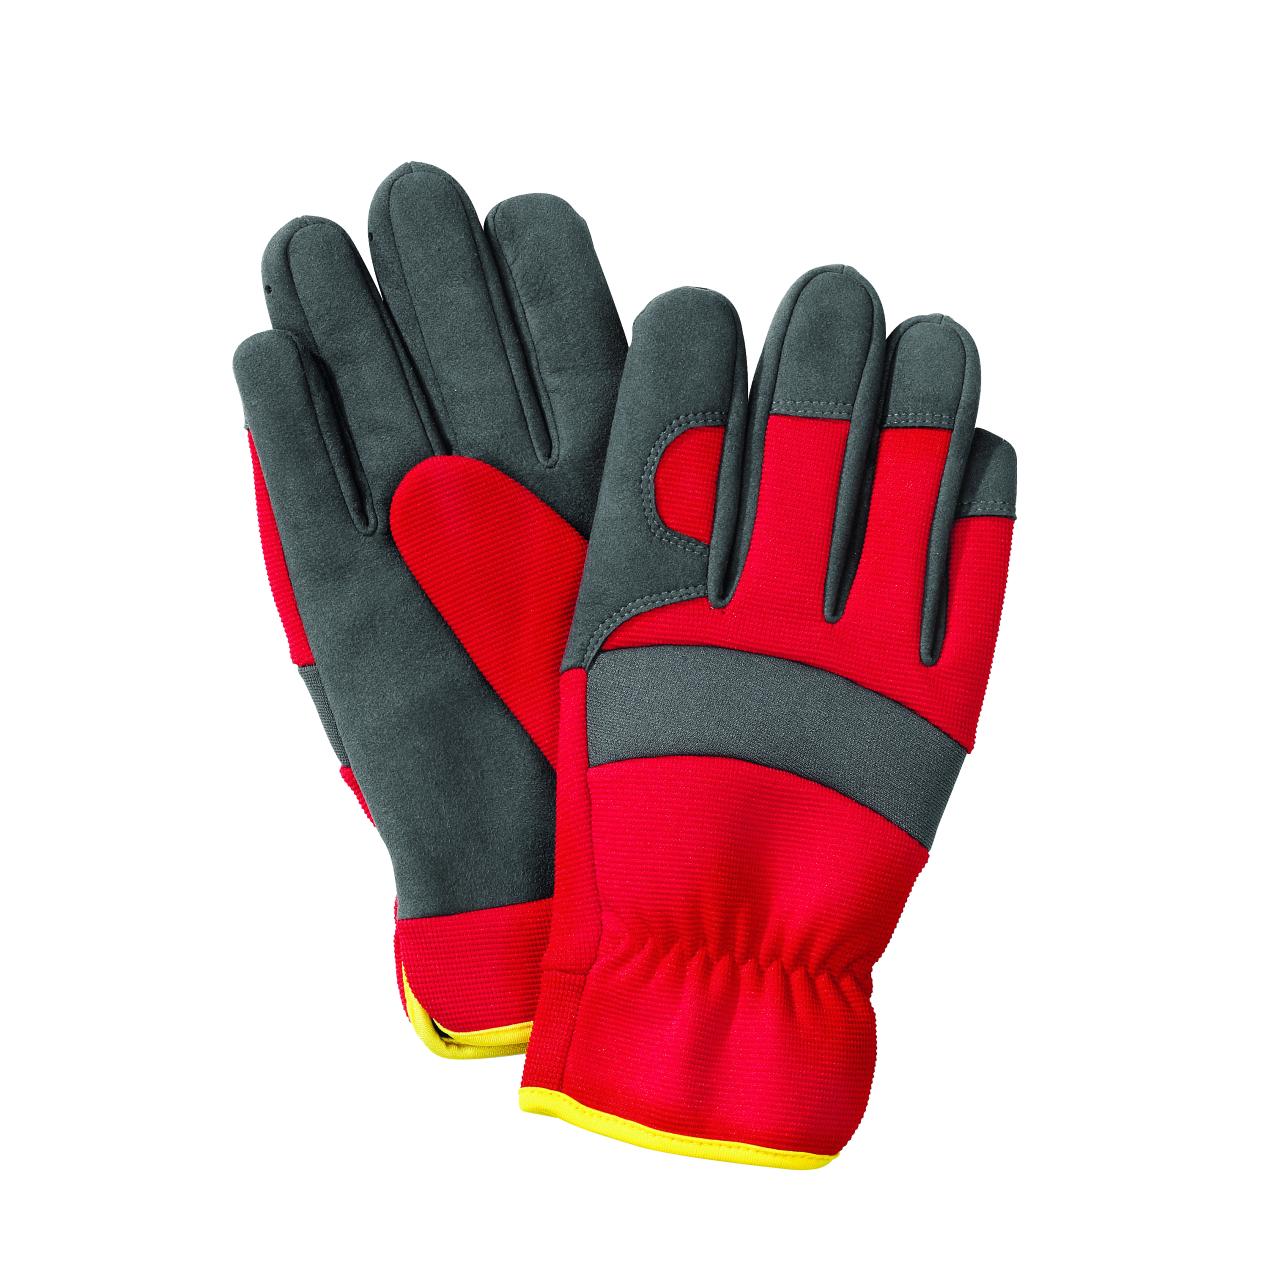 GH-U 8 Universal-Handschuh